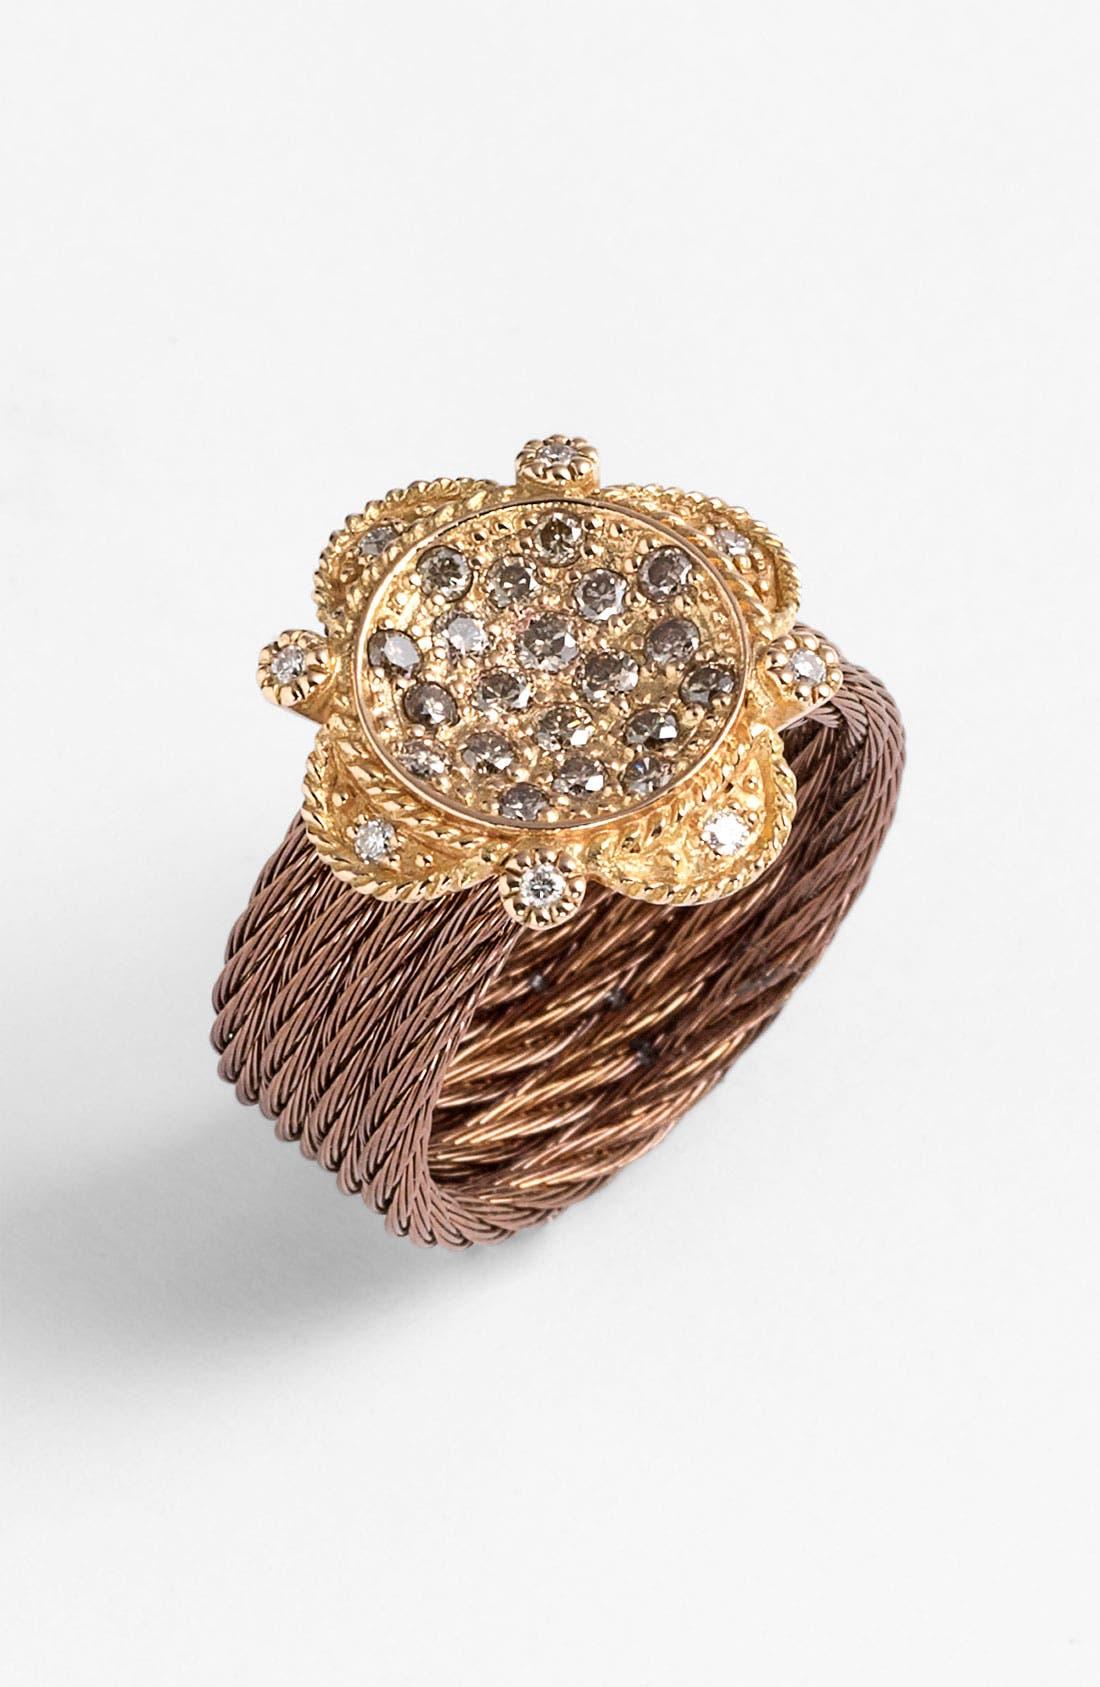 Main Image - ALOR® Champagne Diamond Ring